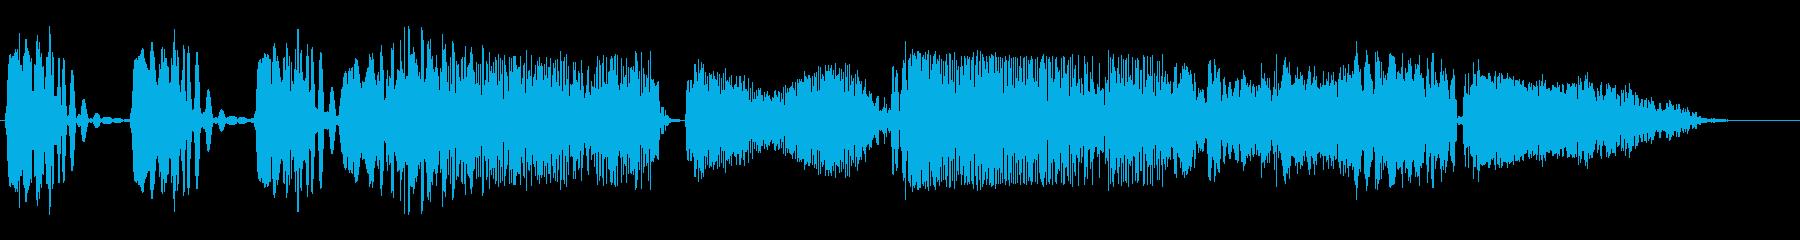 ZapAccents EC09_42_2の再生済みの波形